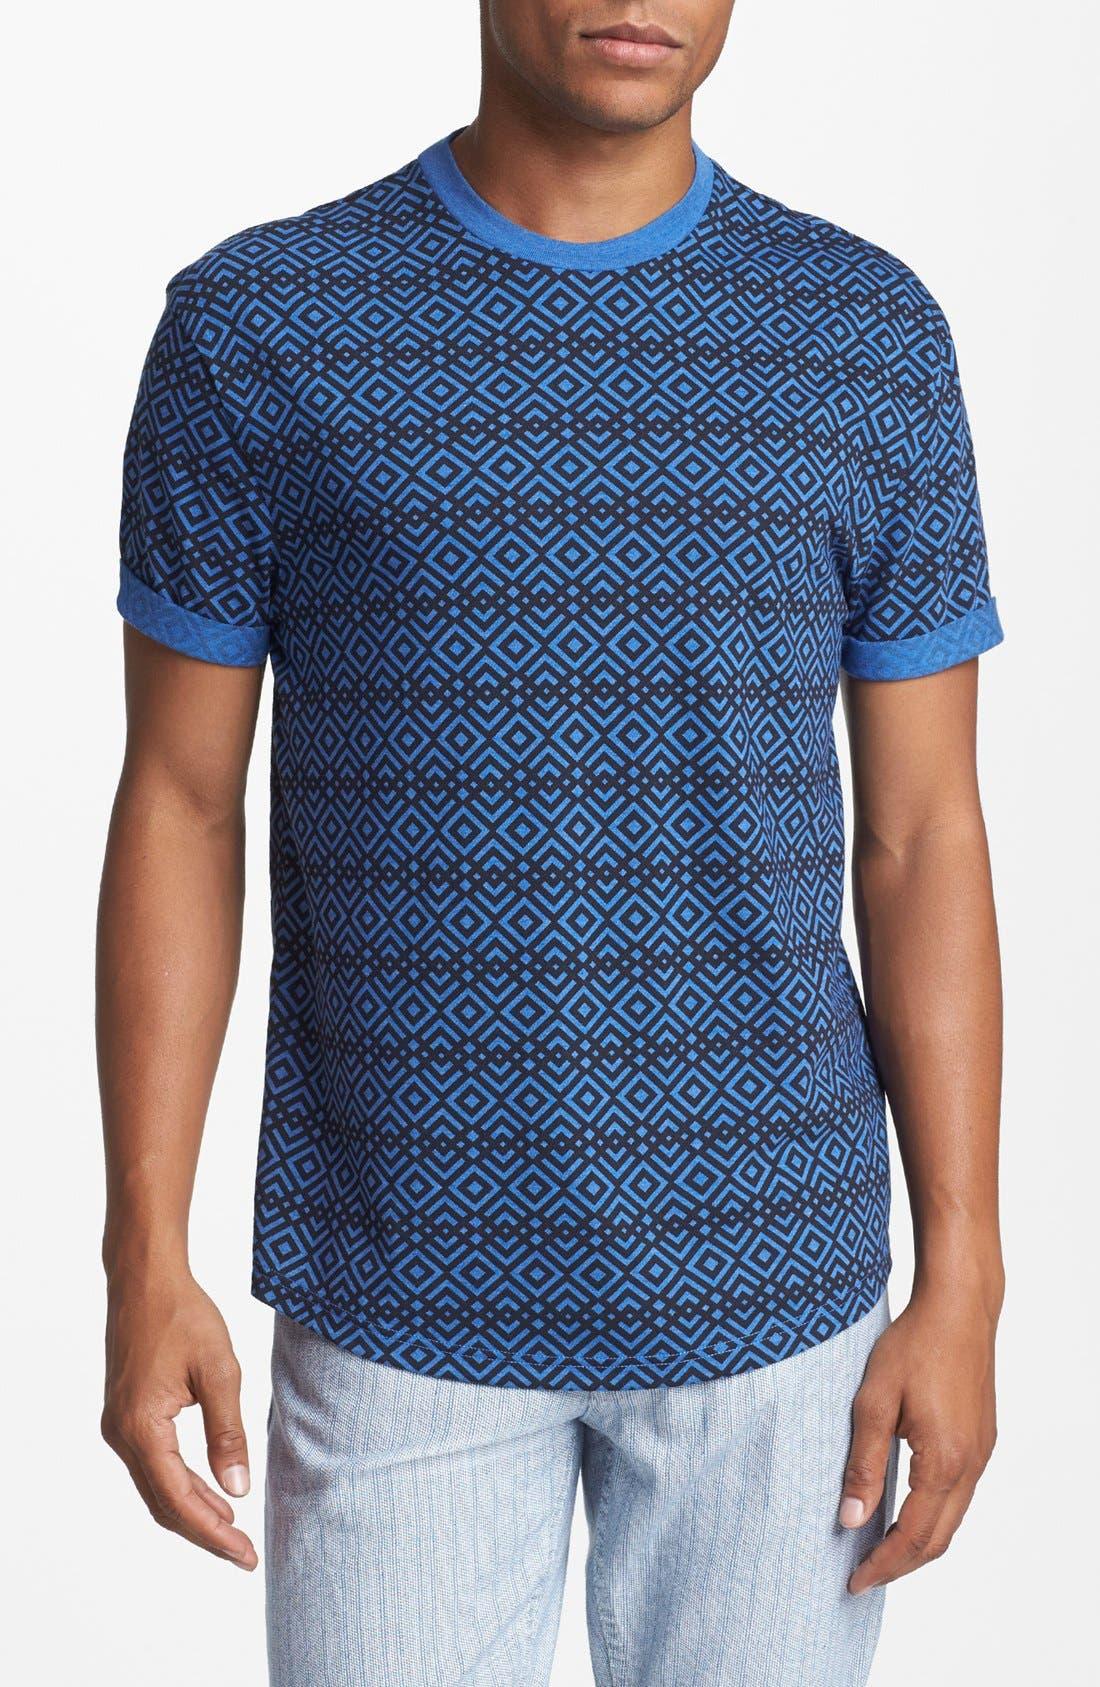 Main Image - Topman Crisscross Print T-Shirt